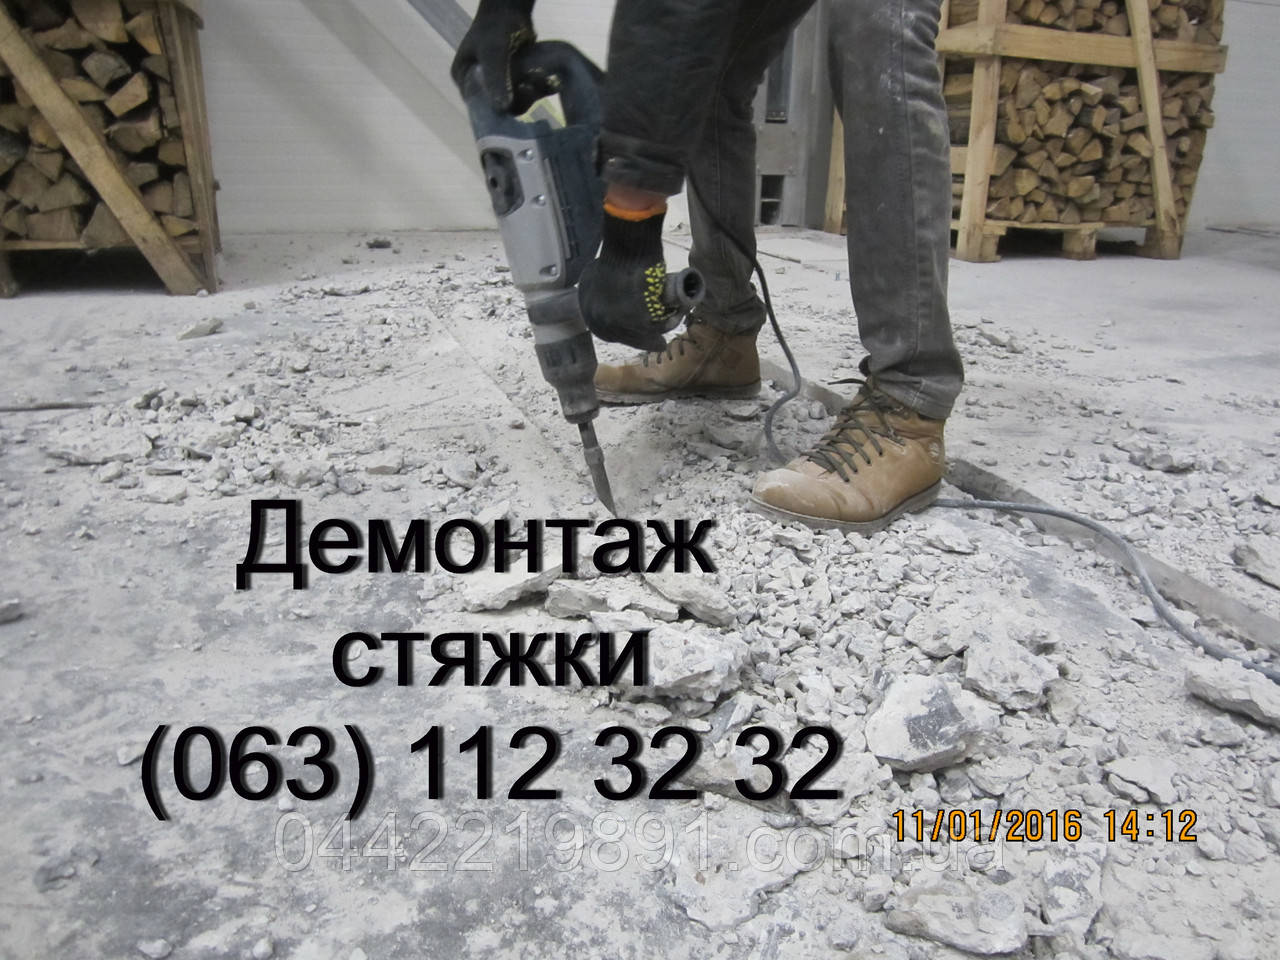 Демонтаж стяжки на полу (063) 112 32 32